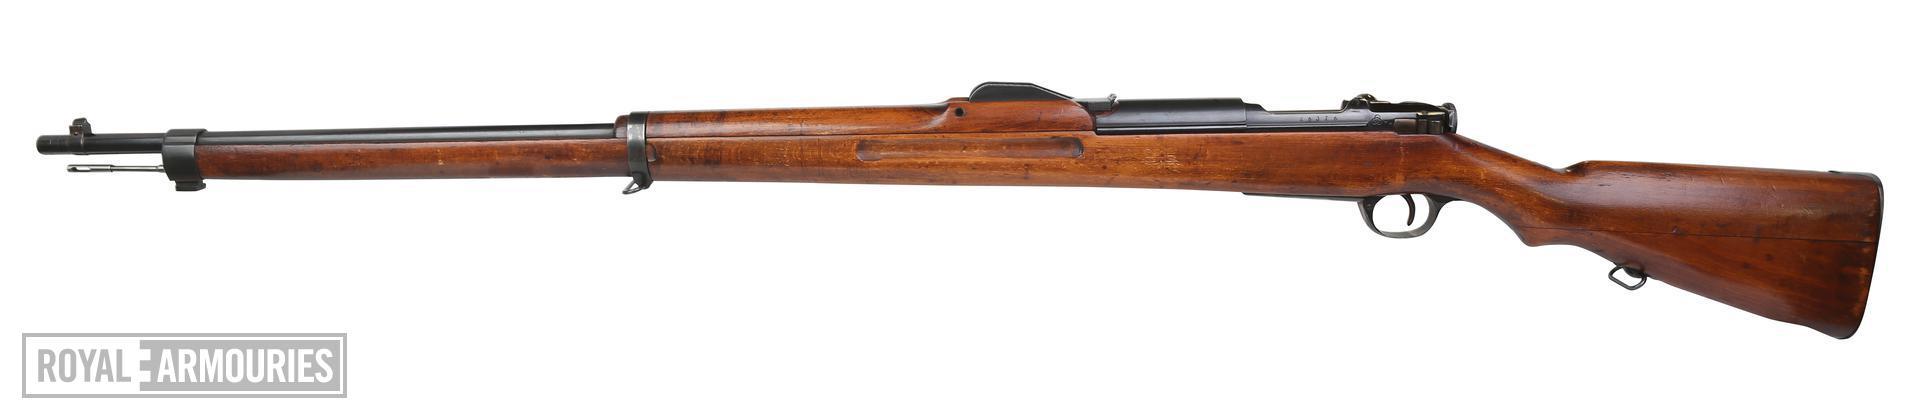 Centrefire bolt-action rifle - Arisaka Type 35